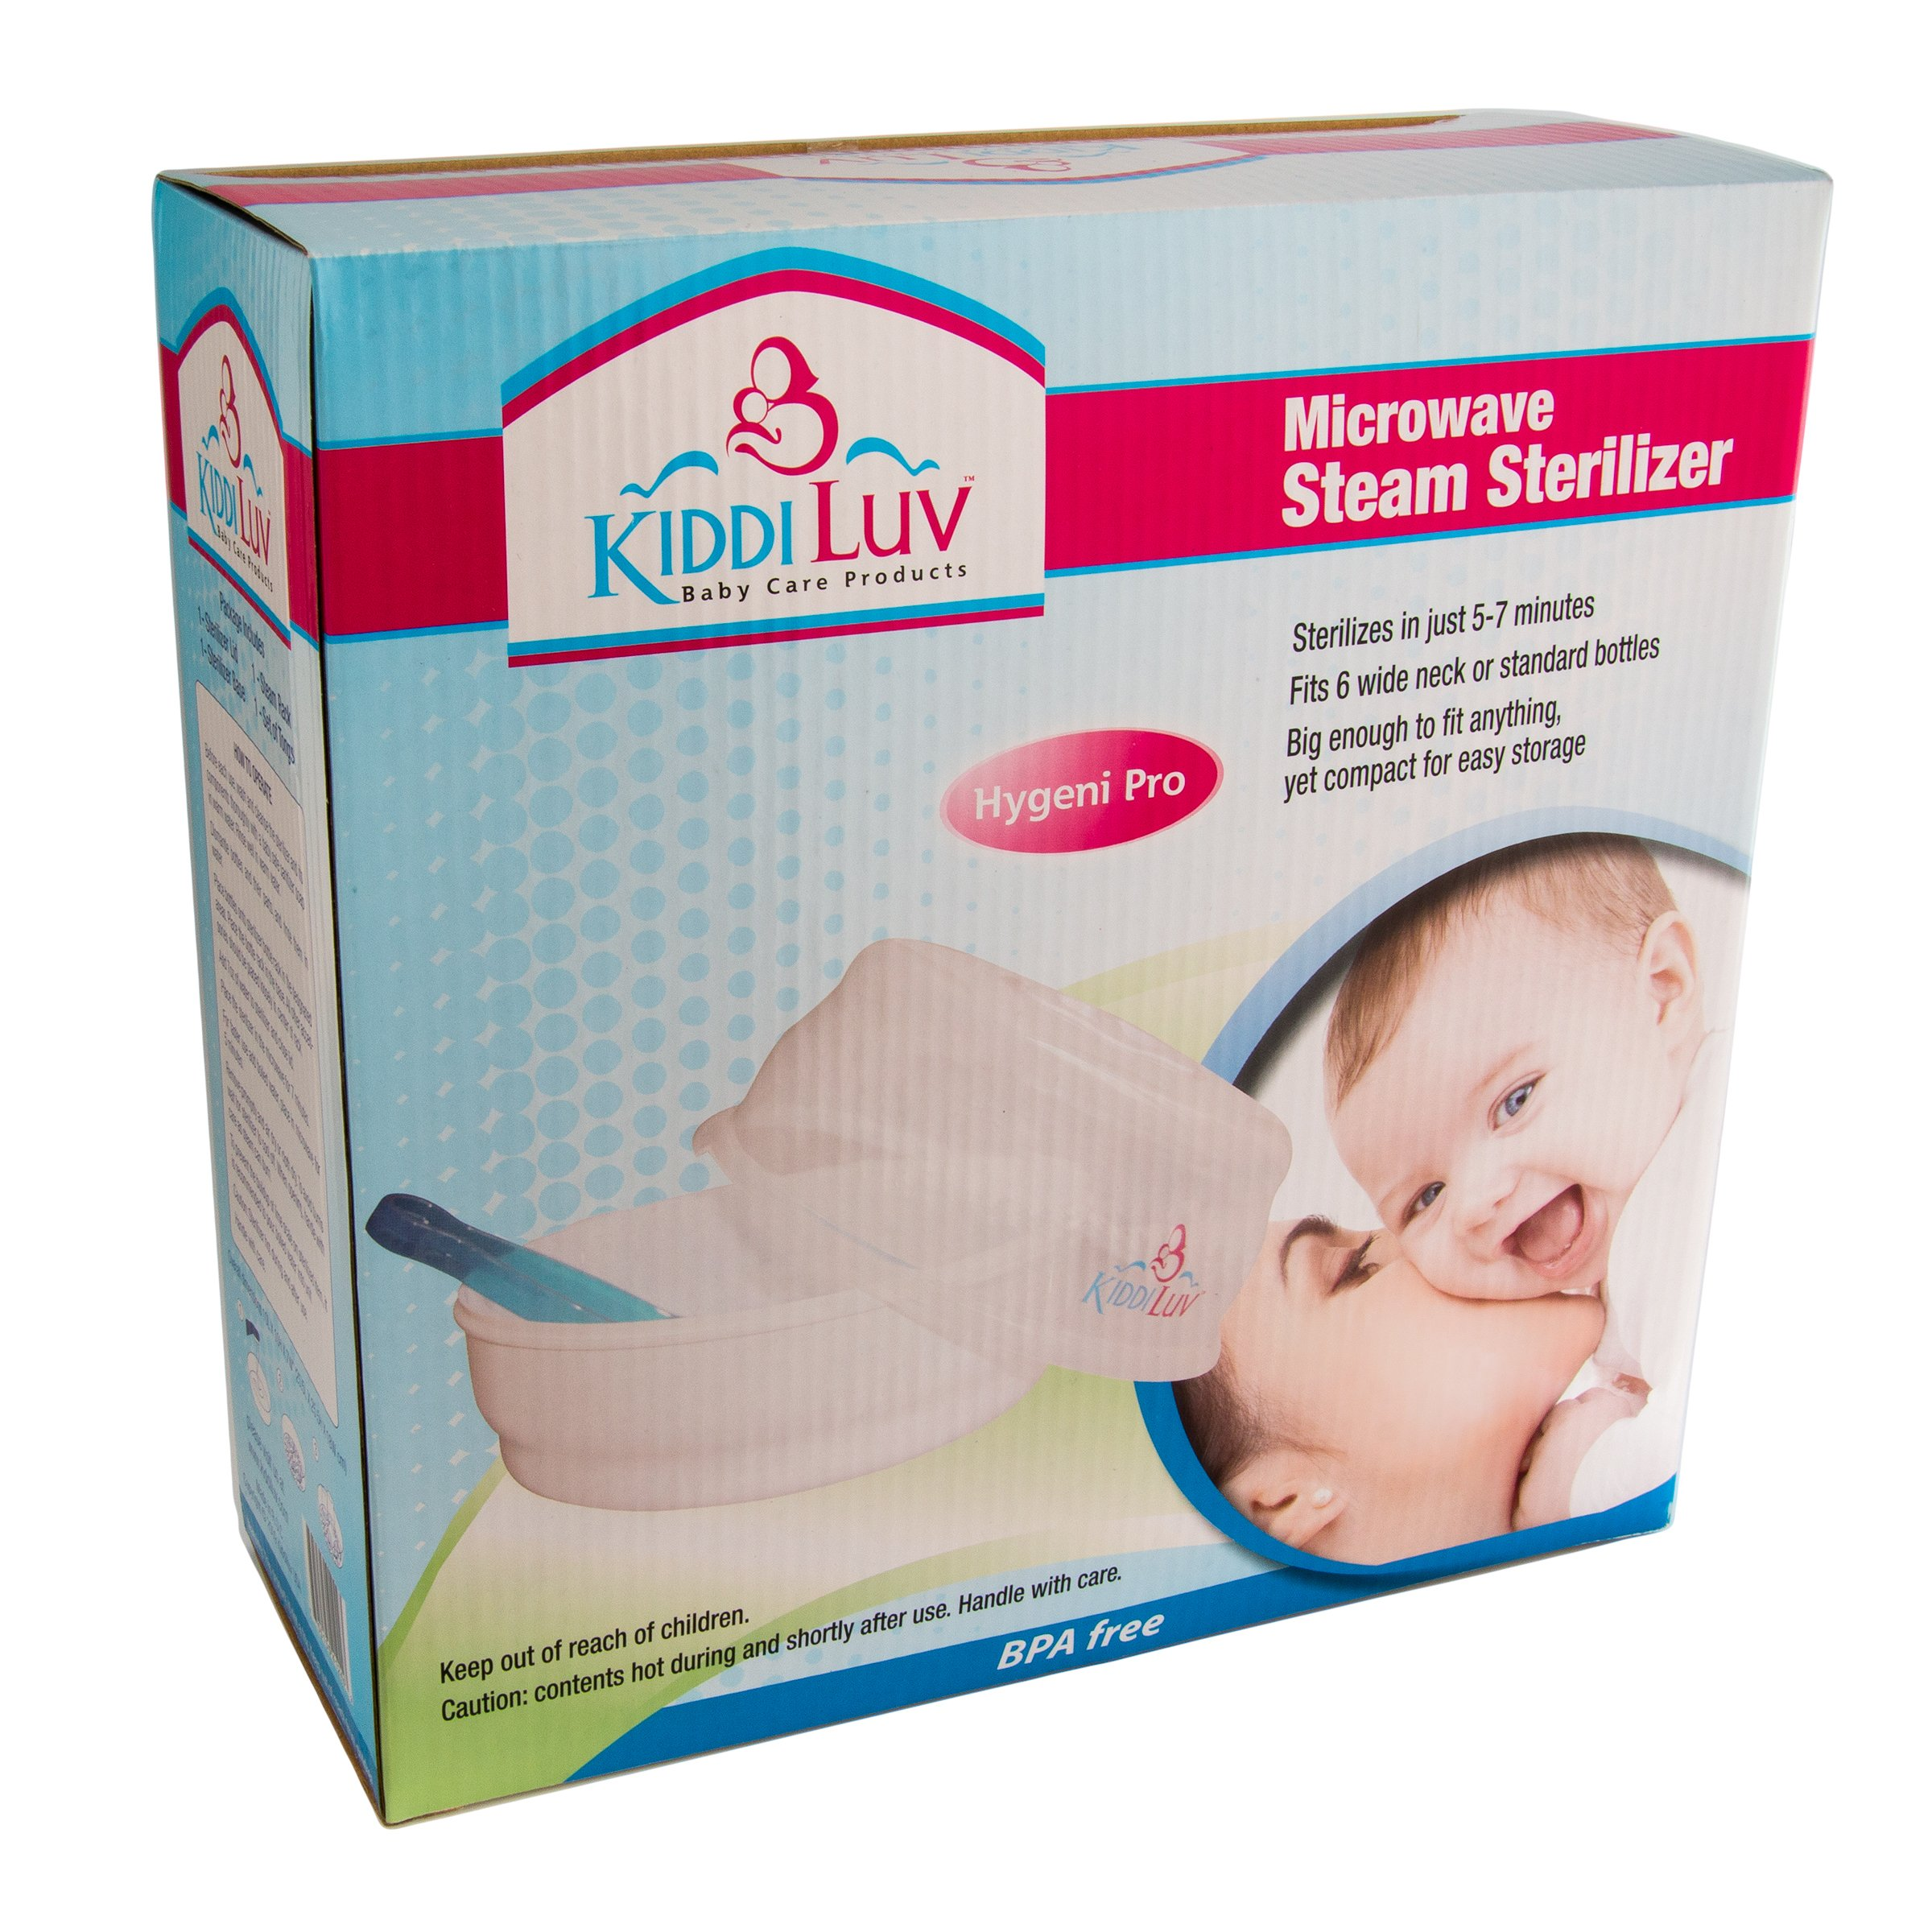 Kiddiluv Microwave Steam Sterilizer - Fits 6 Baby Bottles by Kiddiluv (Image #3)